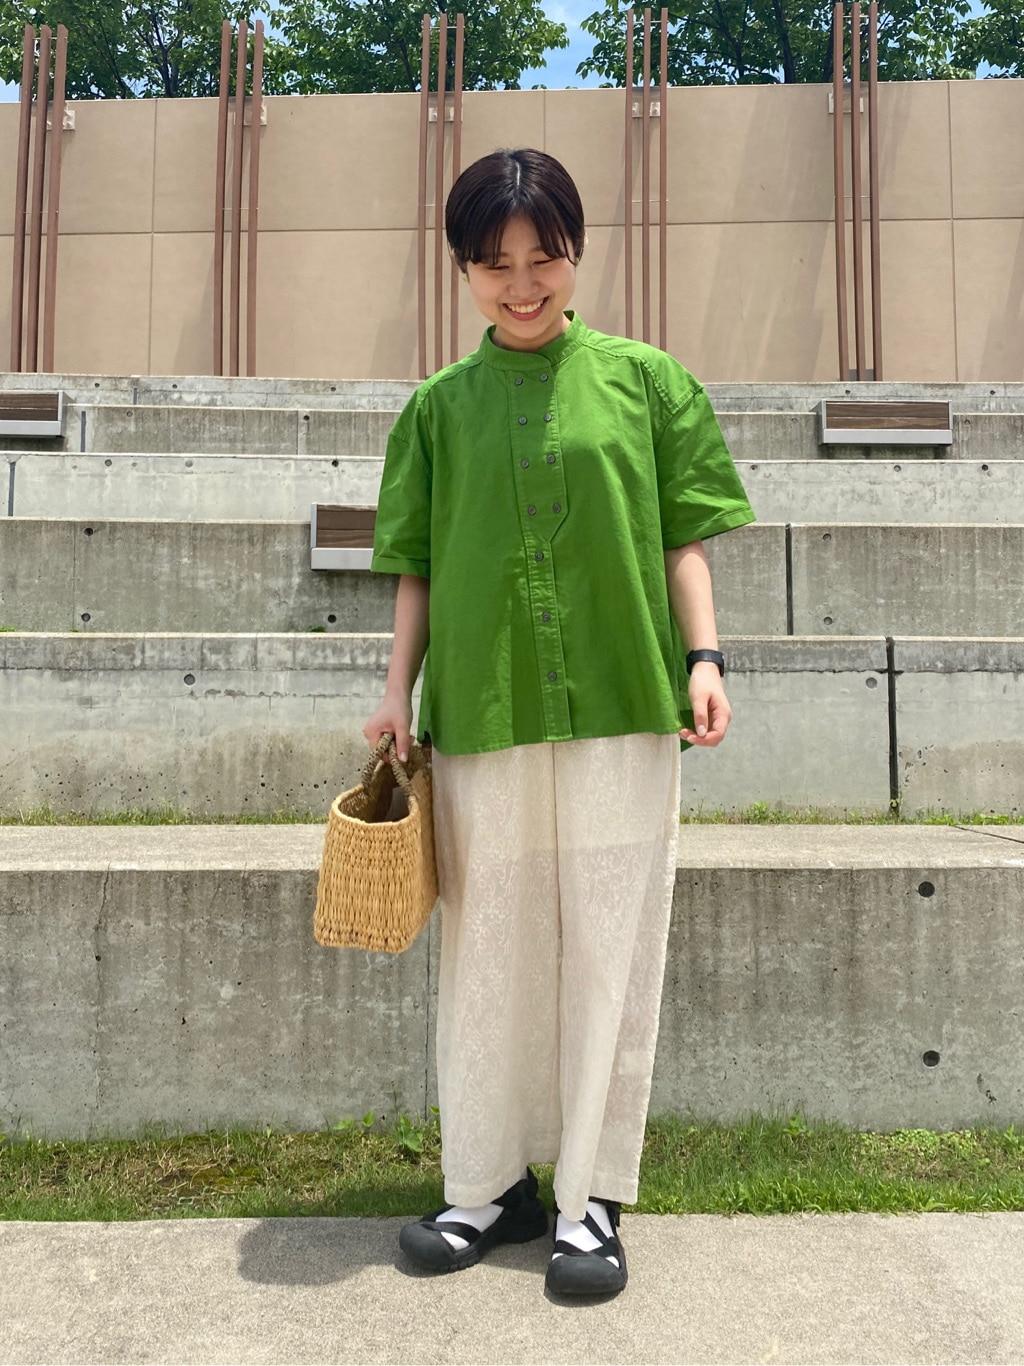 bulle de savon 阪急西宮ガーデンズ 身長:149cm 2021.06.08